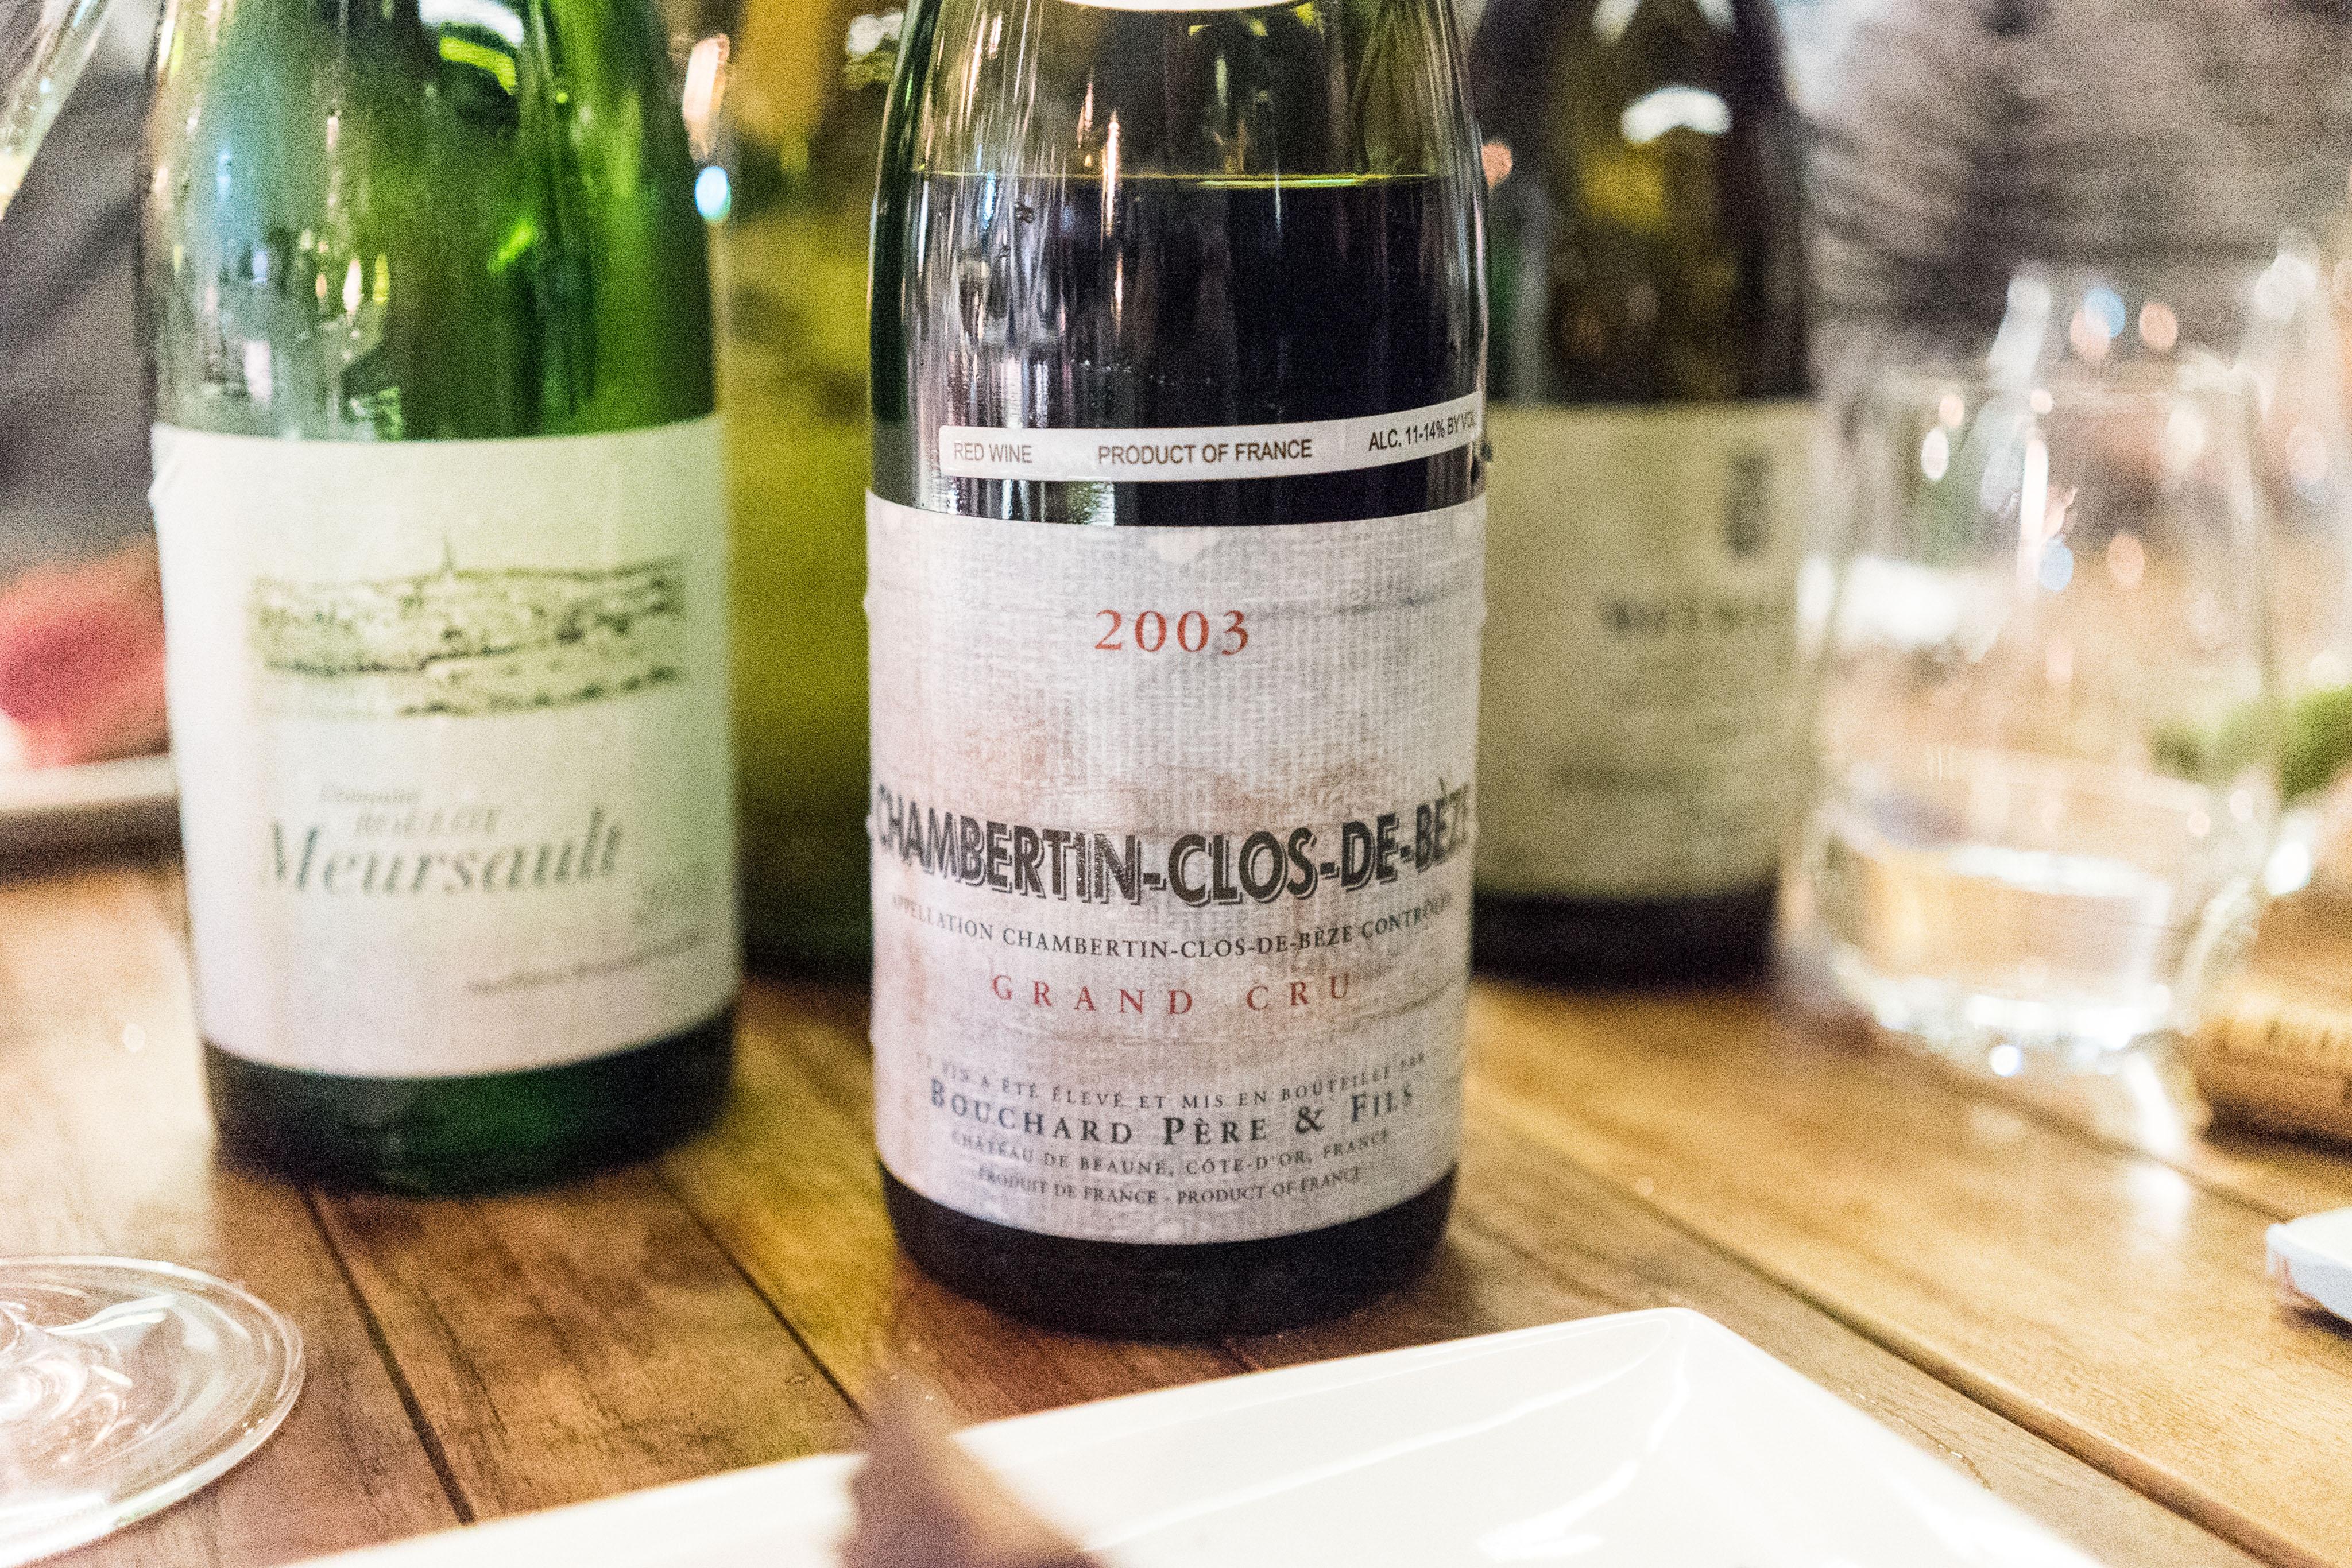 Bouchard Pere & Fils Chambertin-Clos-de-Beze Grand Cru 2003